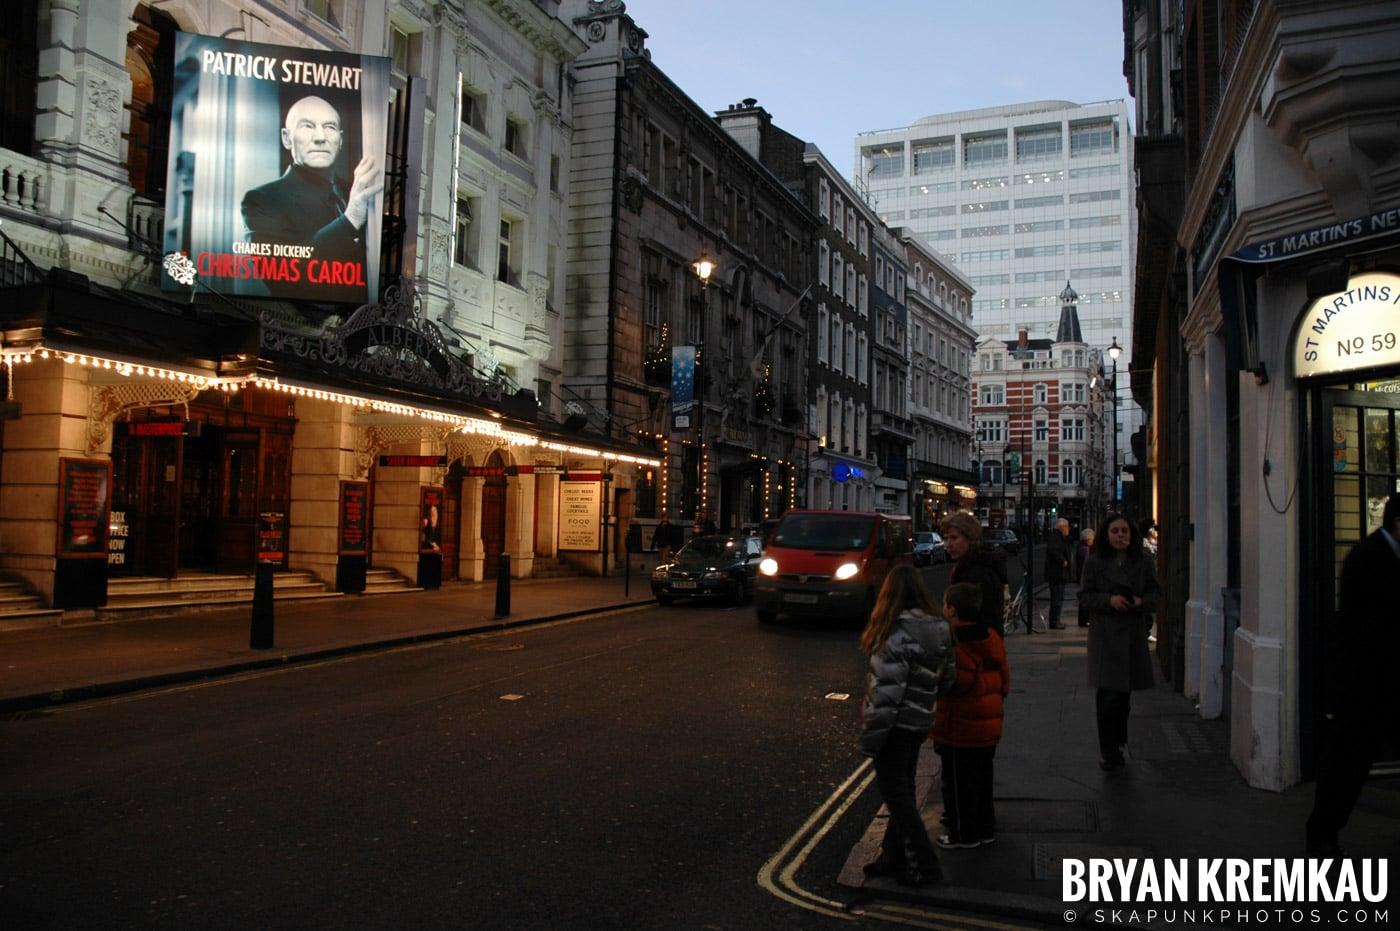 London, England - Day 4 - 12.19.05 (4)